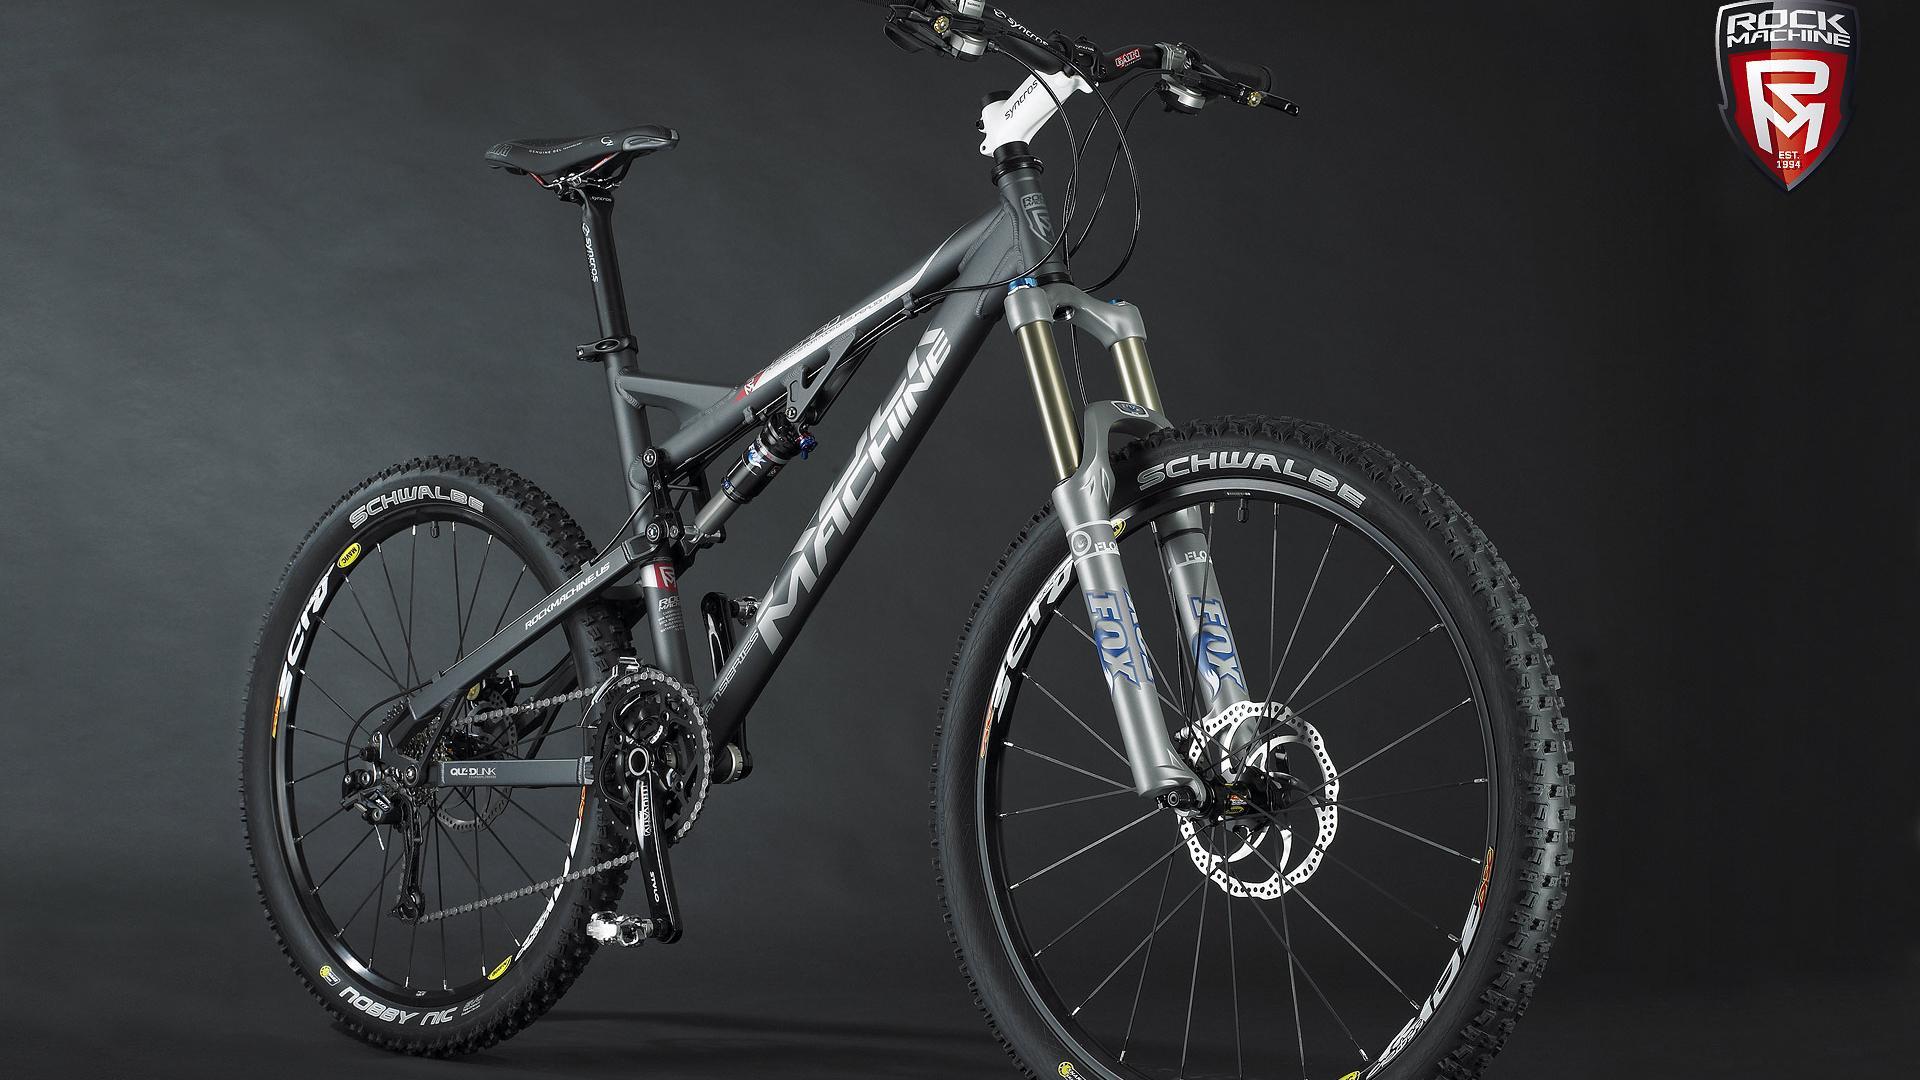 bicycle racing image hd